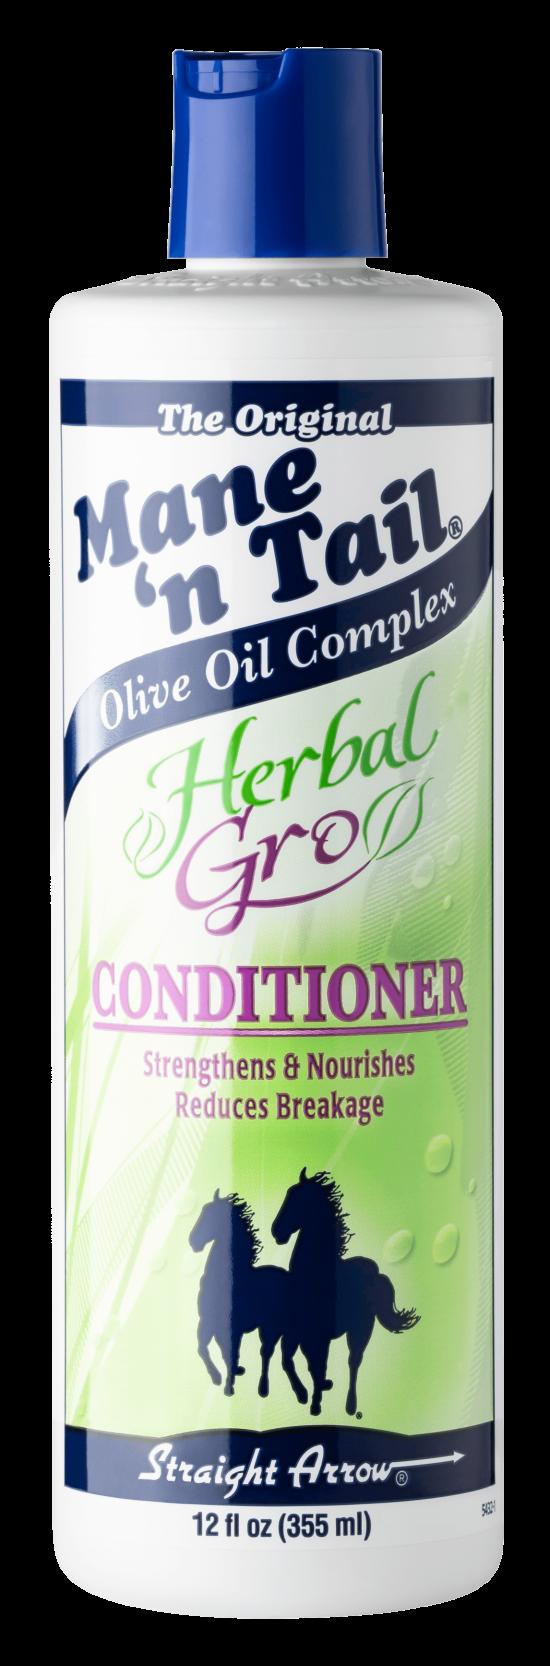 Herbal Gro Conditioner 12 oz bottle